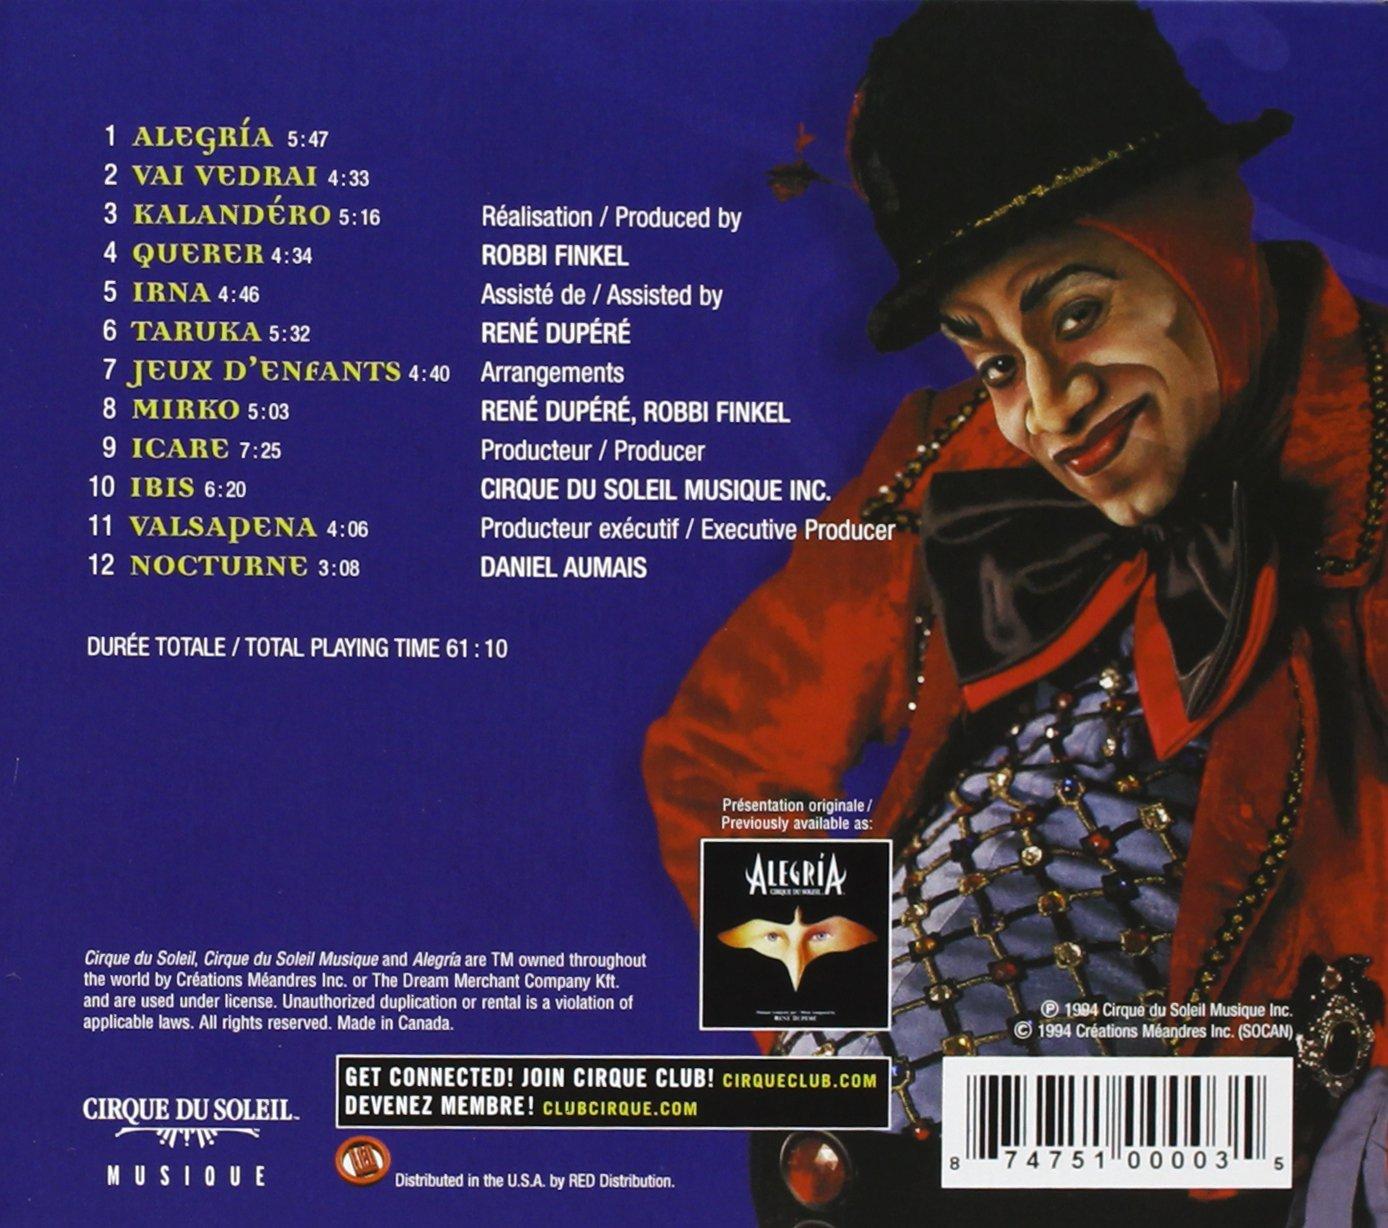 VAREKAI BAIXAR CD